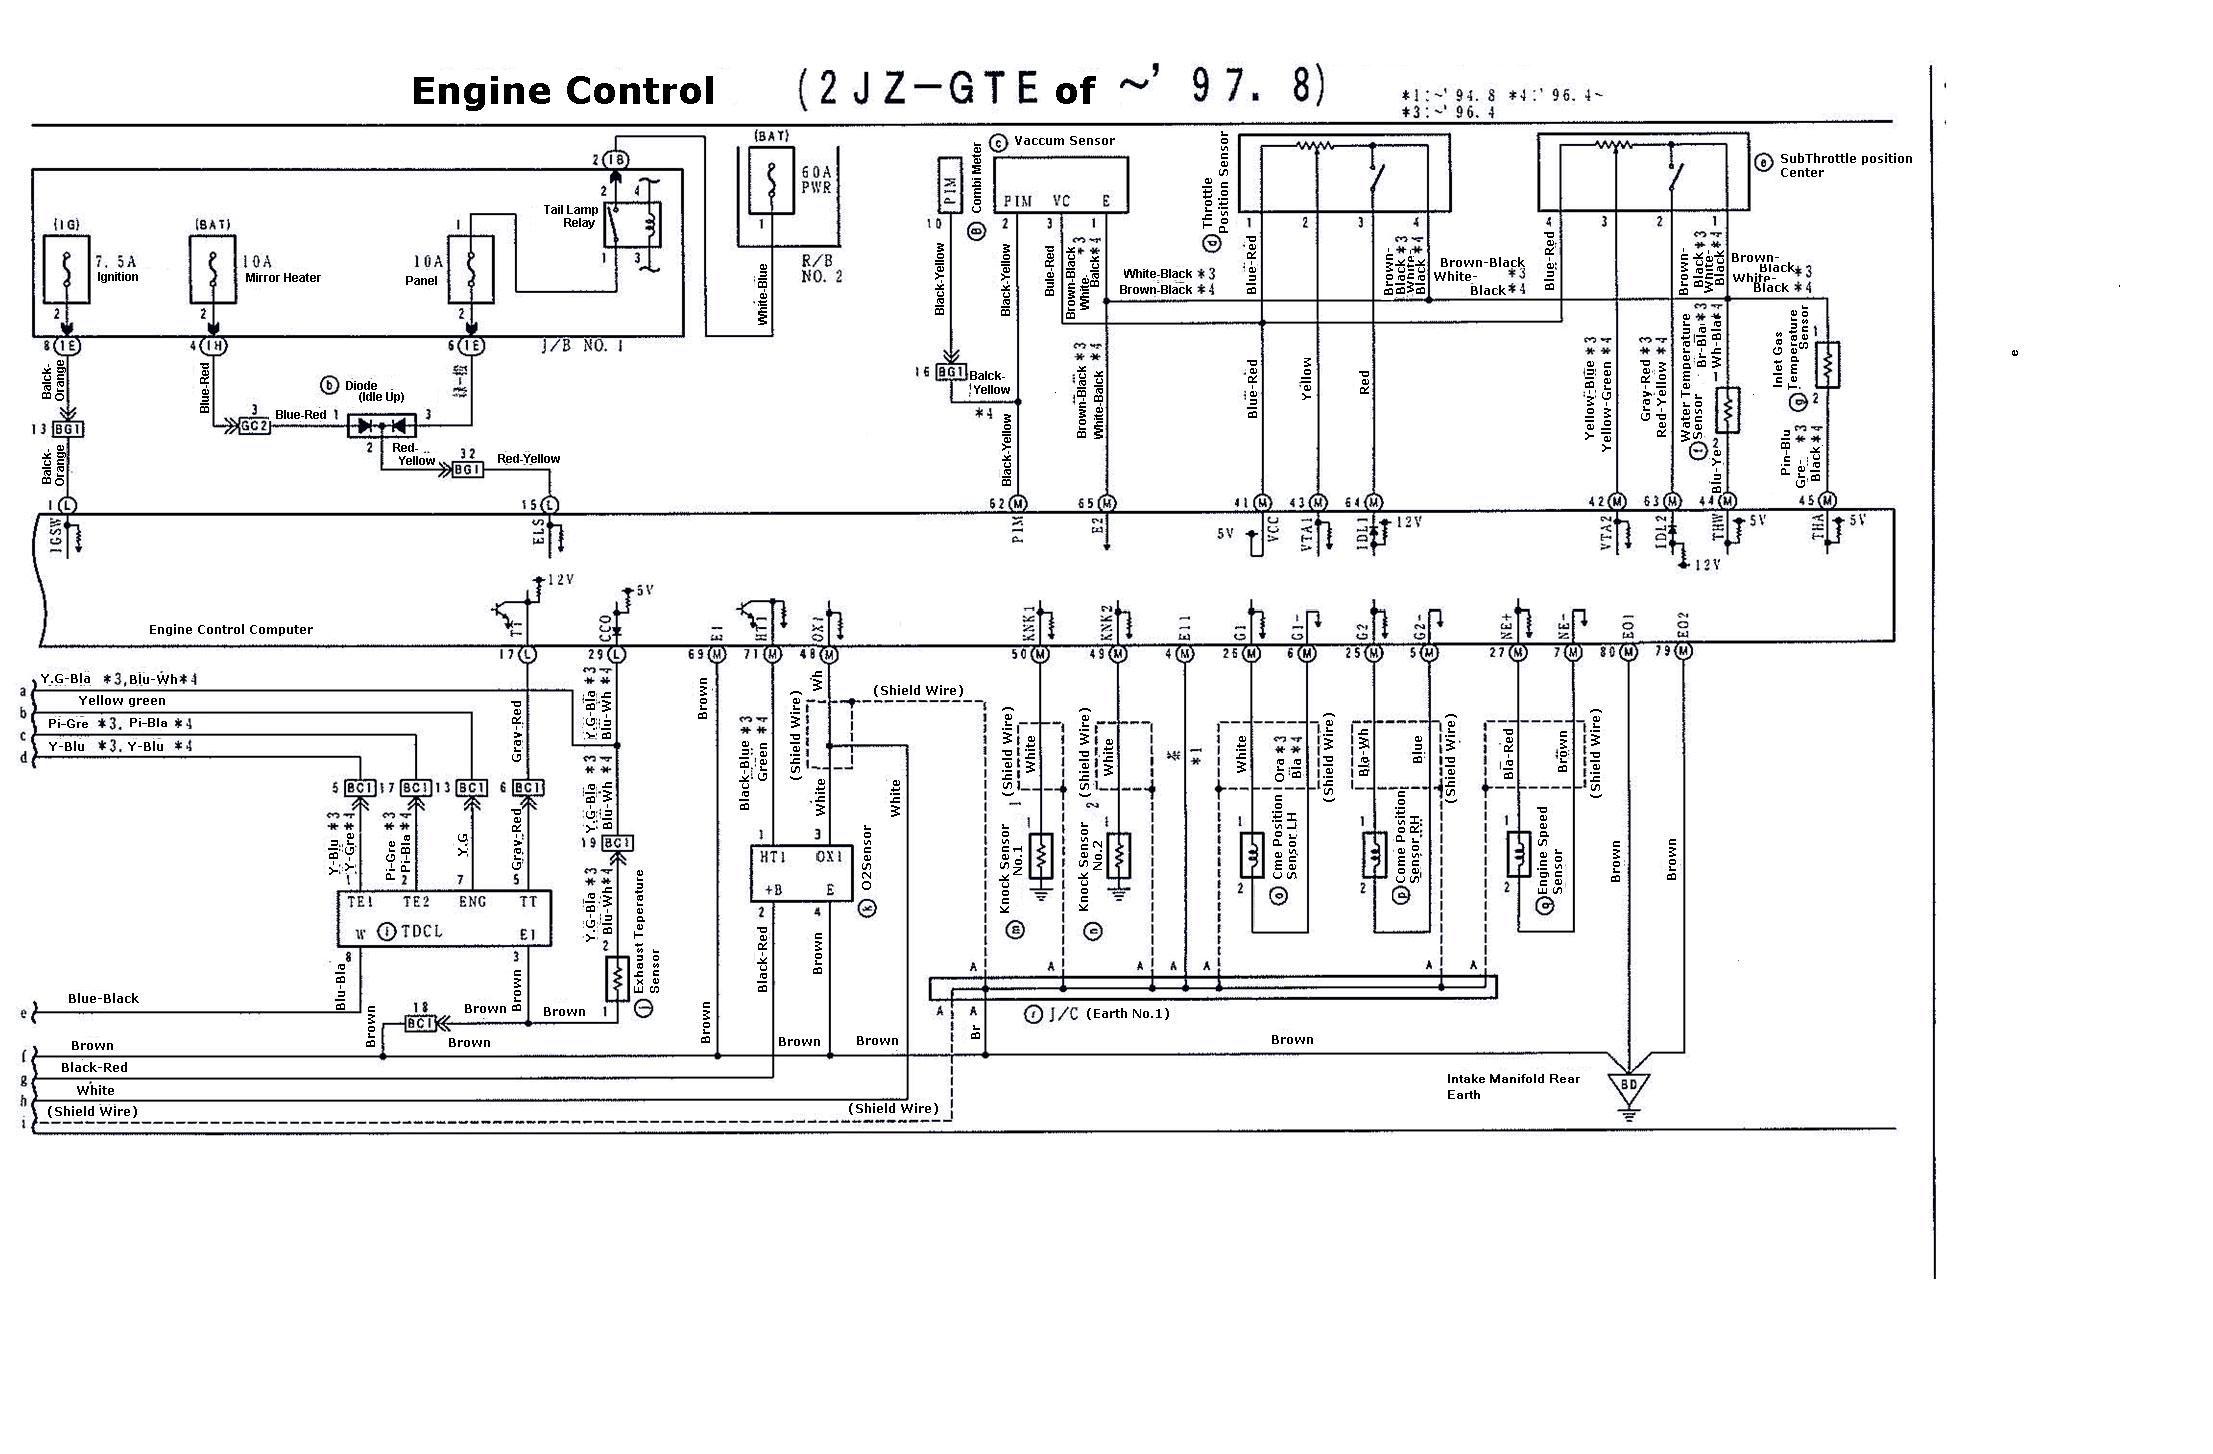 Supra 2jzgte Vvti Wiring Diagrams  97 8-02